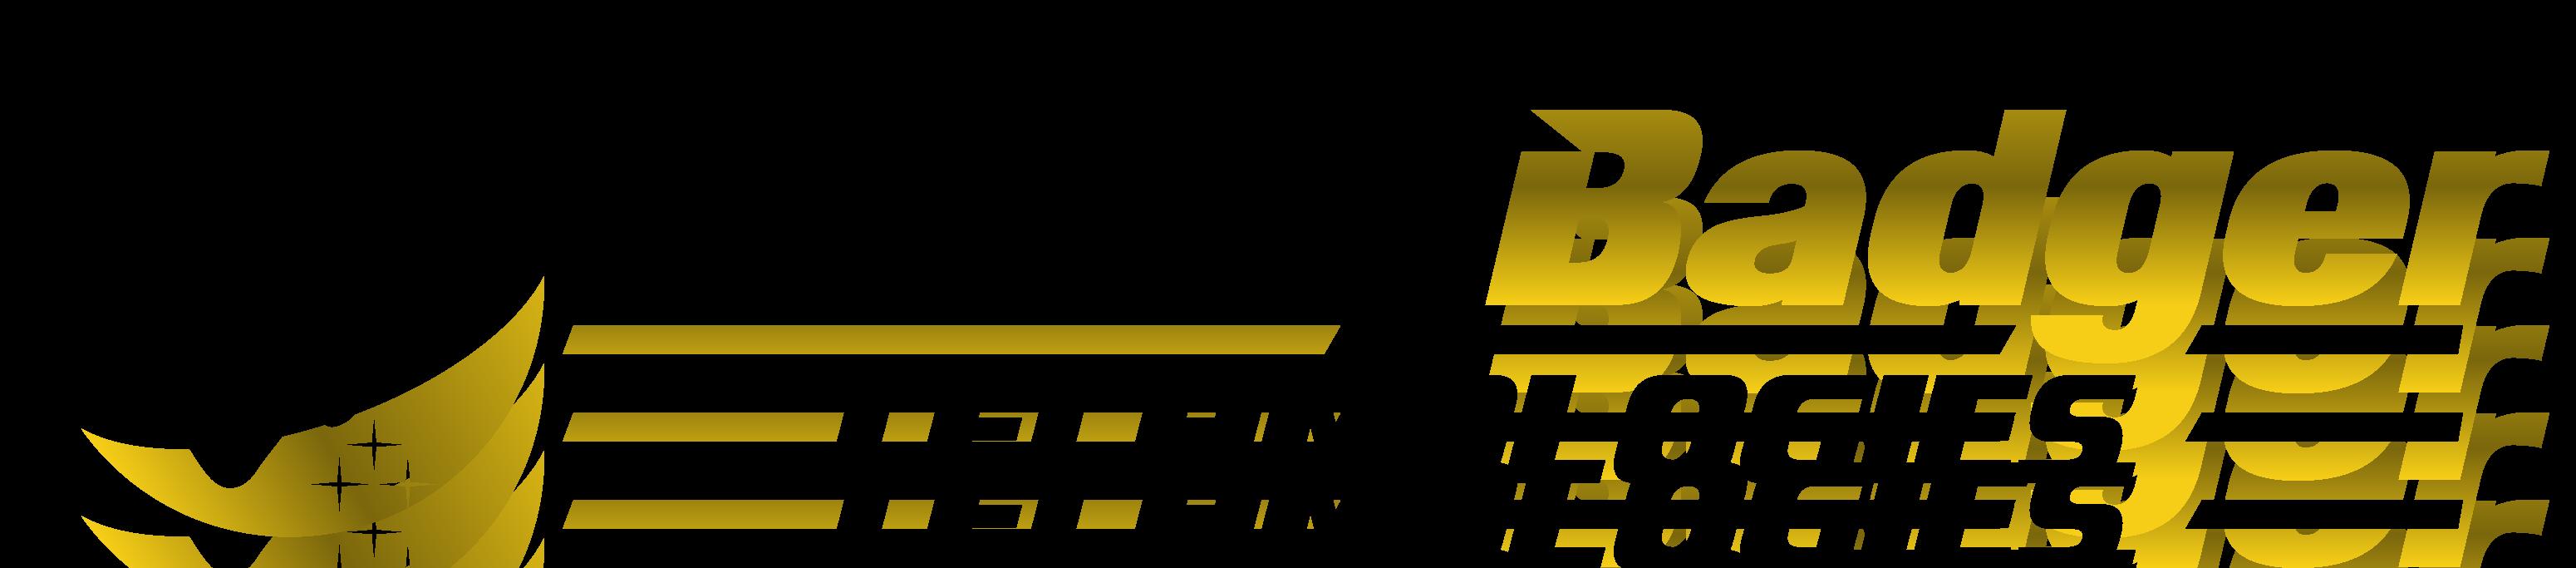 Honeybadger Technologies